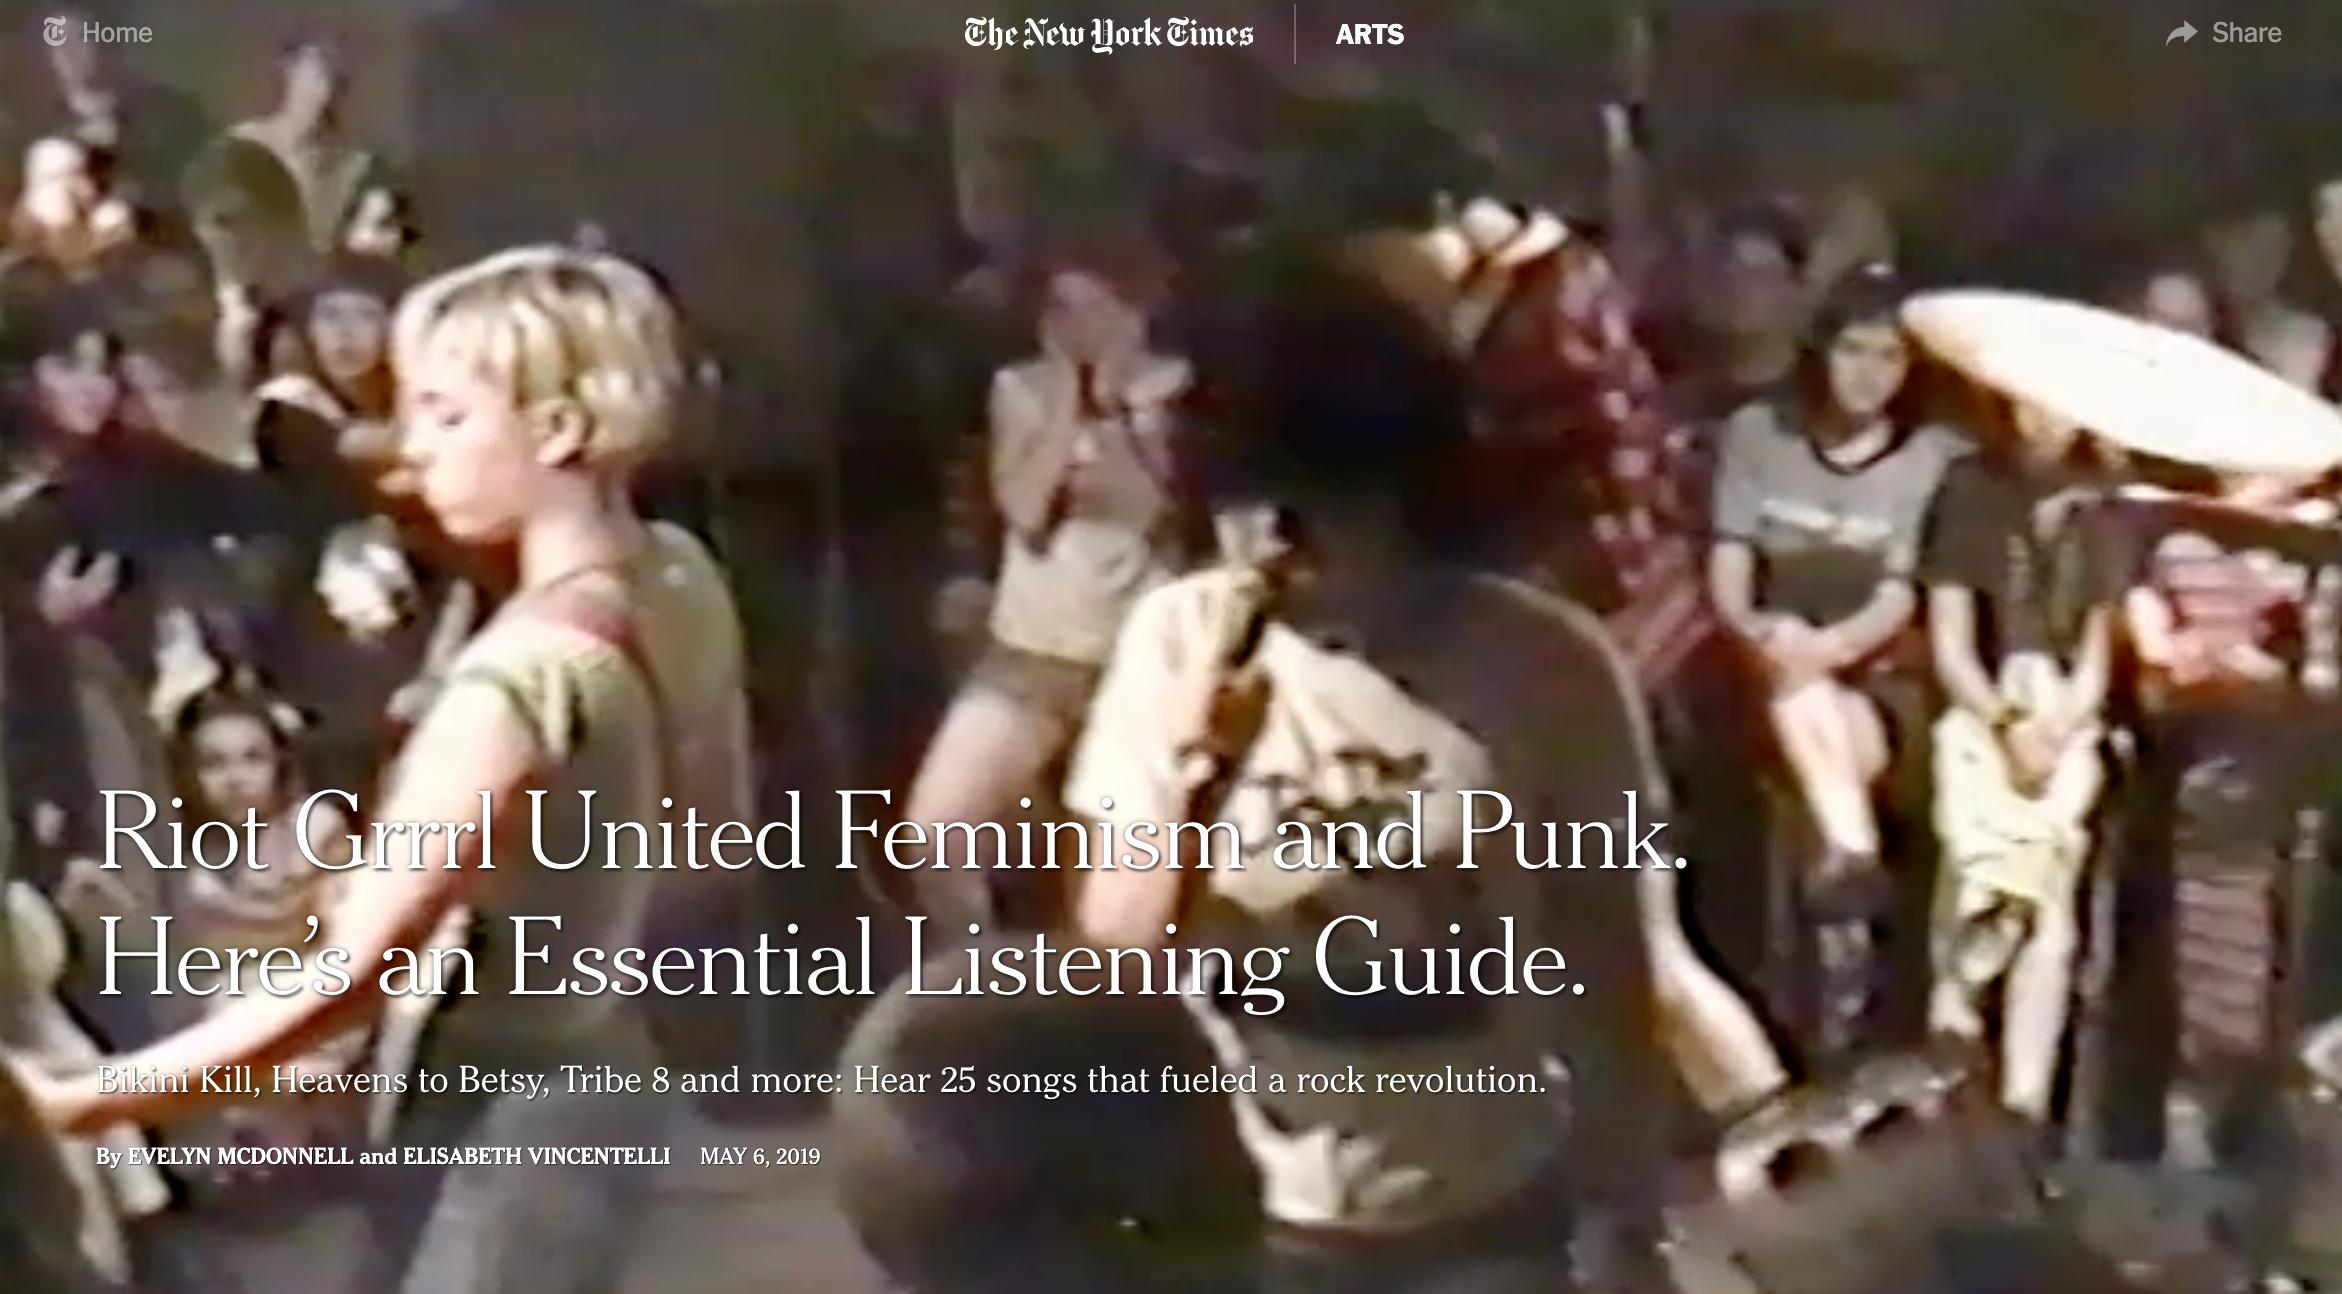 NYTimes Popcast